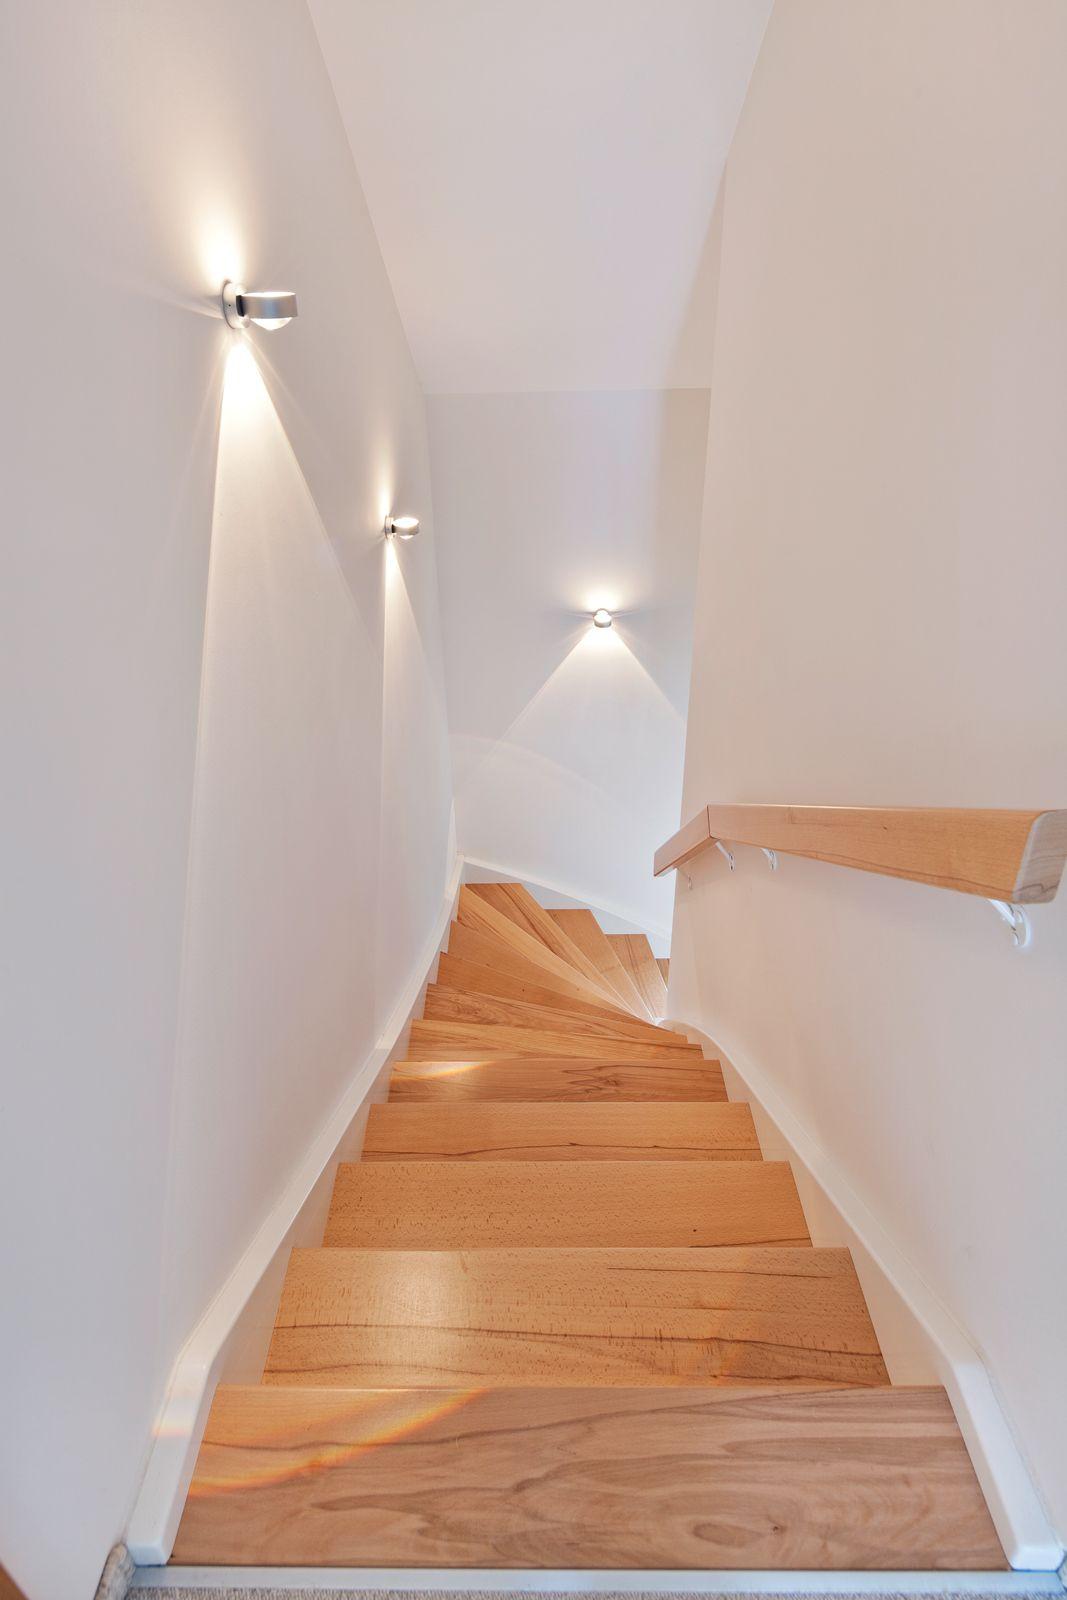 Holztreppe Mit Beleuchtung Inspiration Treppenhaus Beleuchtung Treppen Design Treppenhausgestaltung